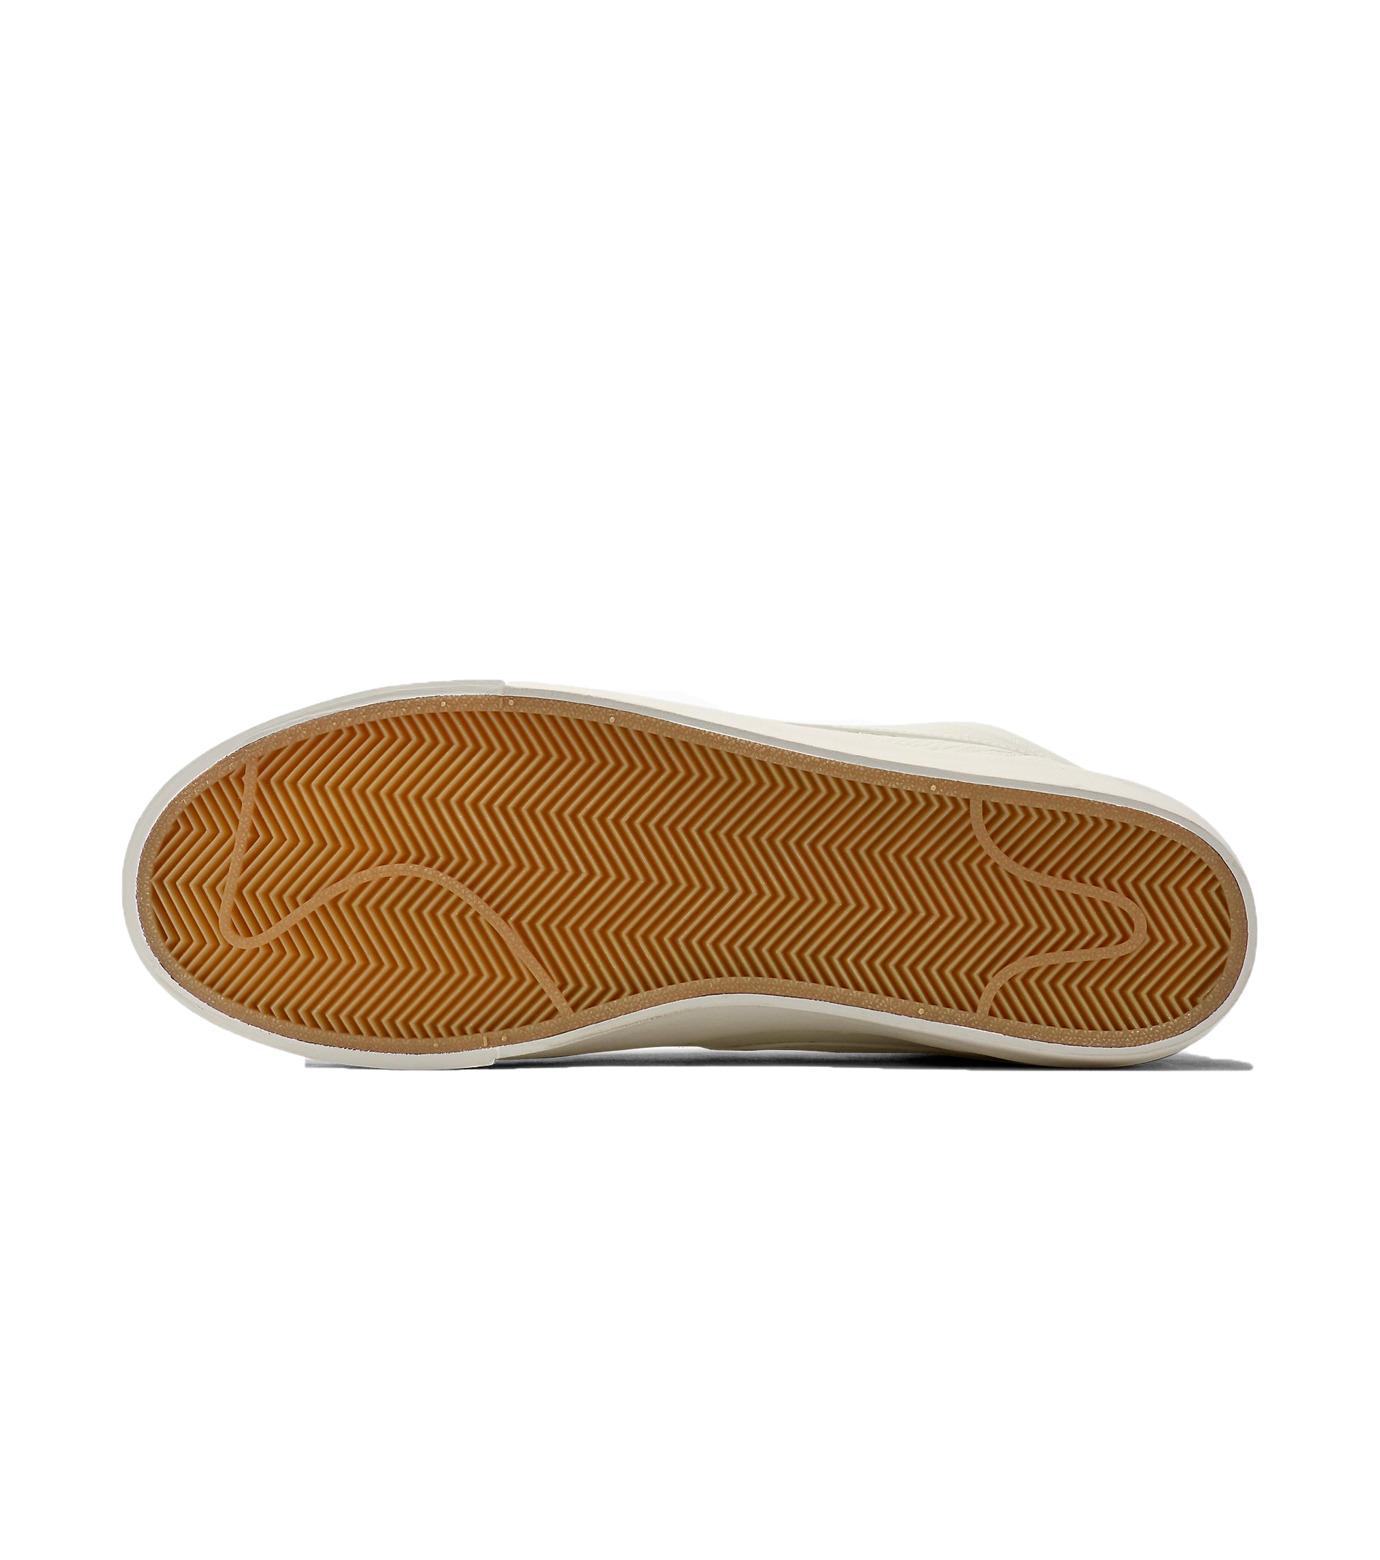 NIKE(ナイキ)のBLAZER STUDIO MID-WHITE(シューズ/shoes)-904805-100-4 拡大詳細画像2